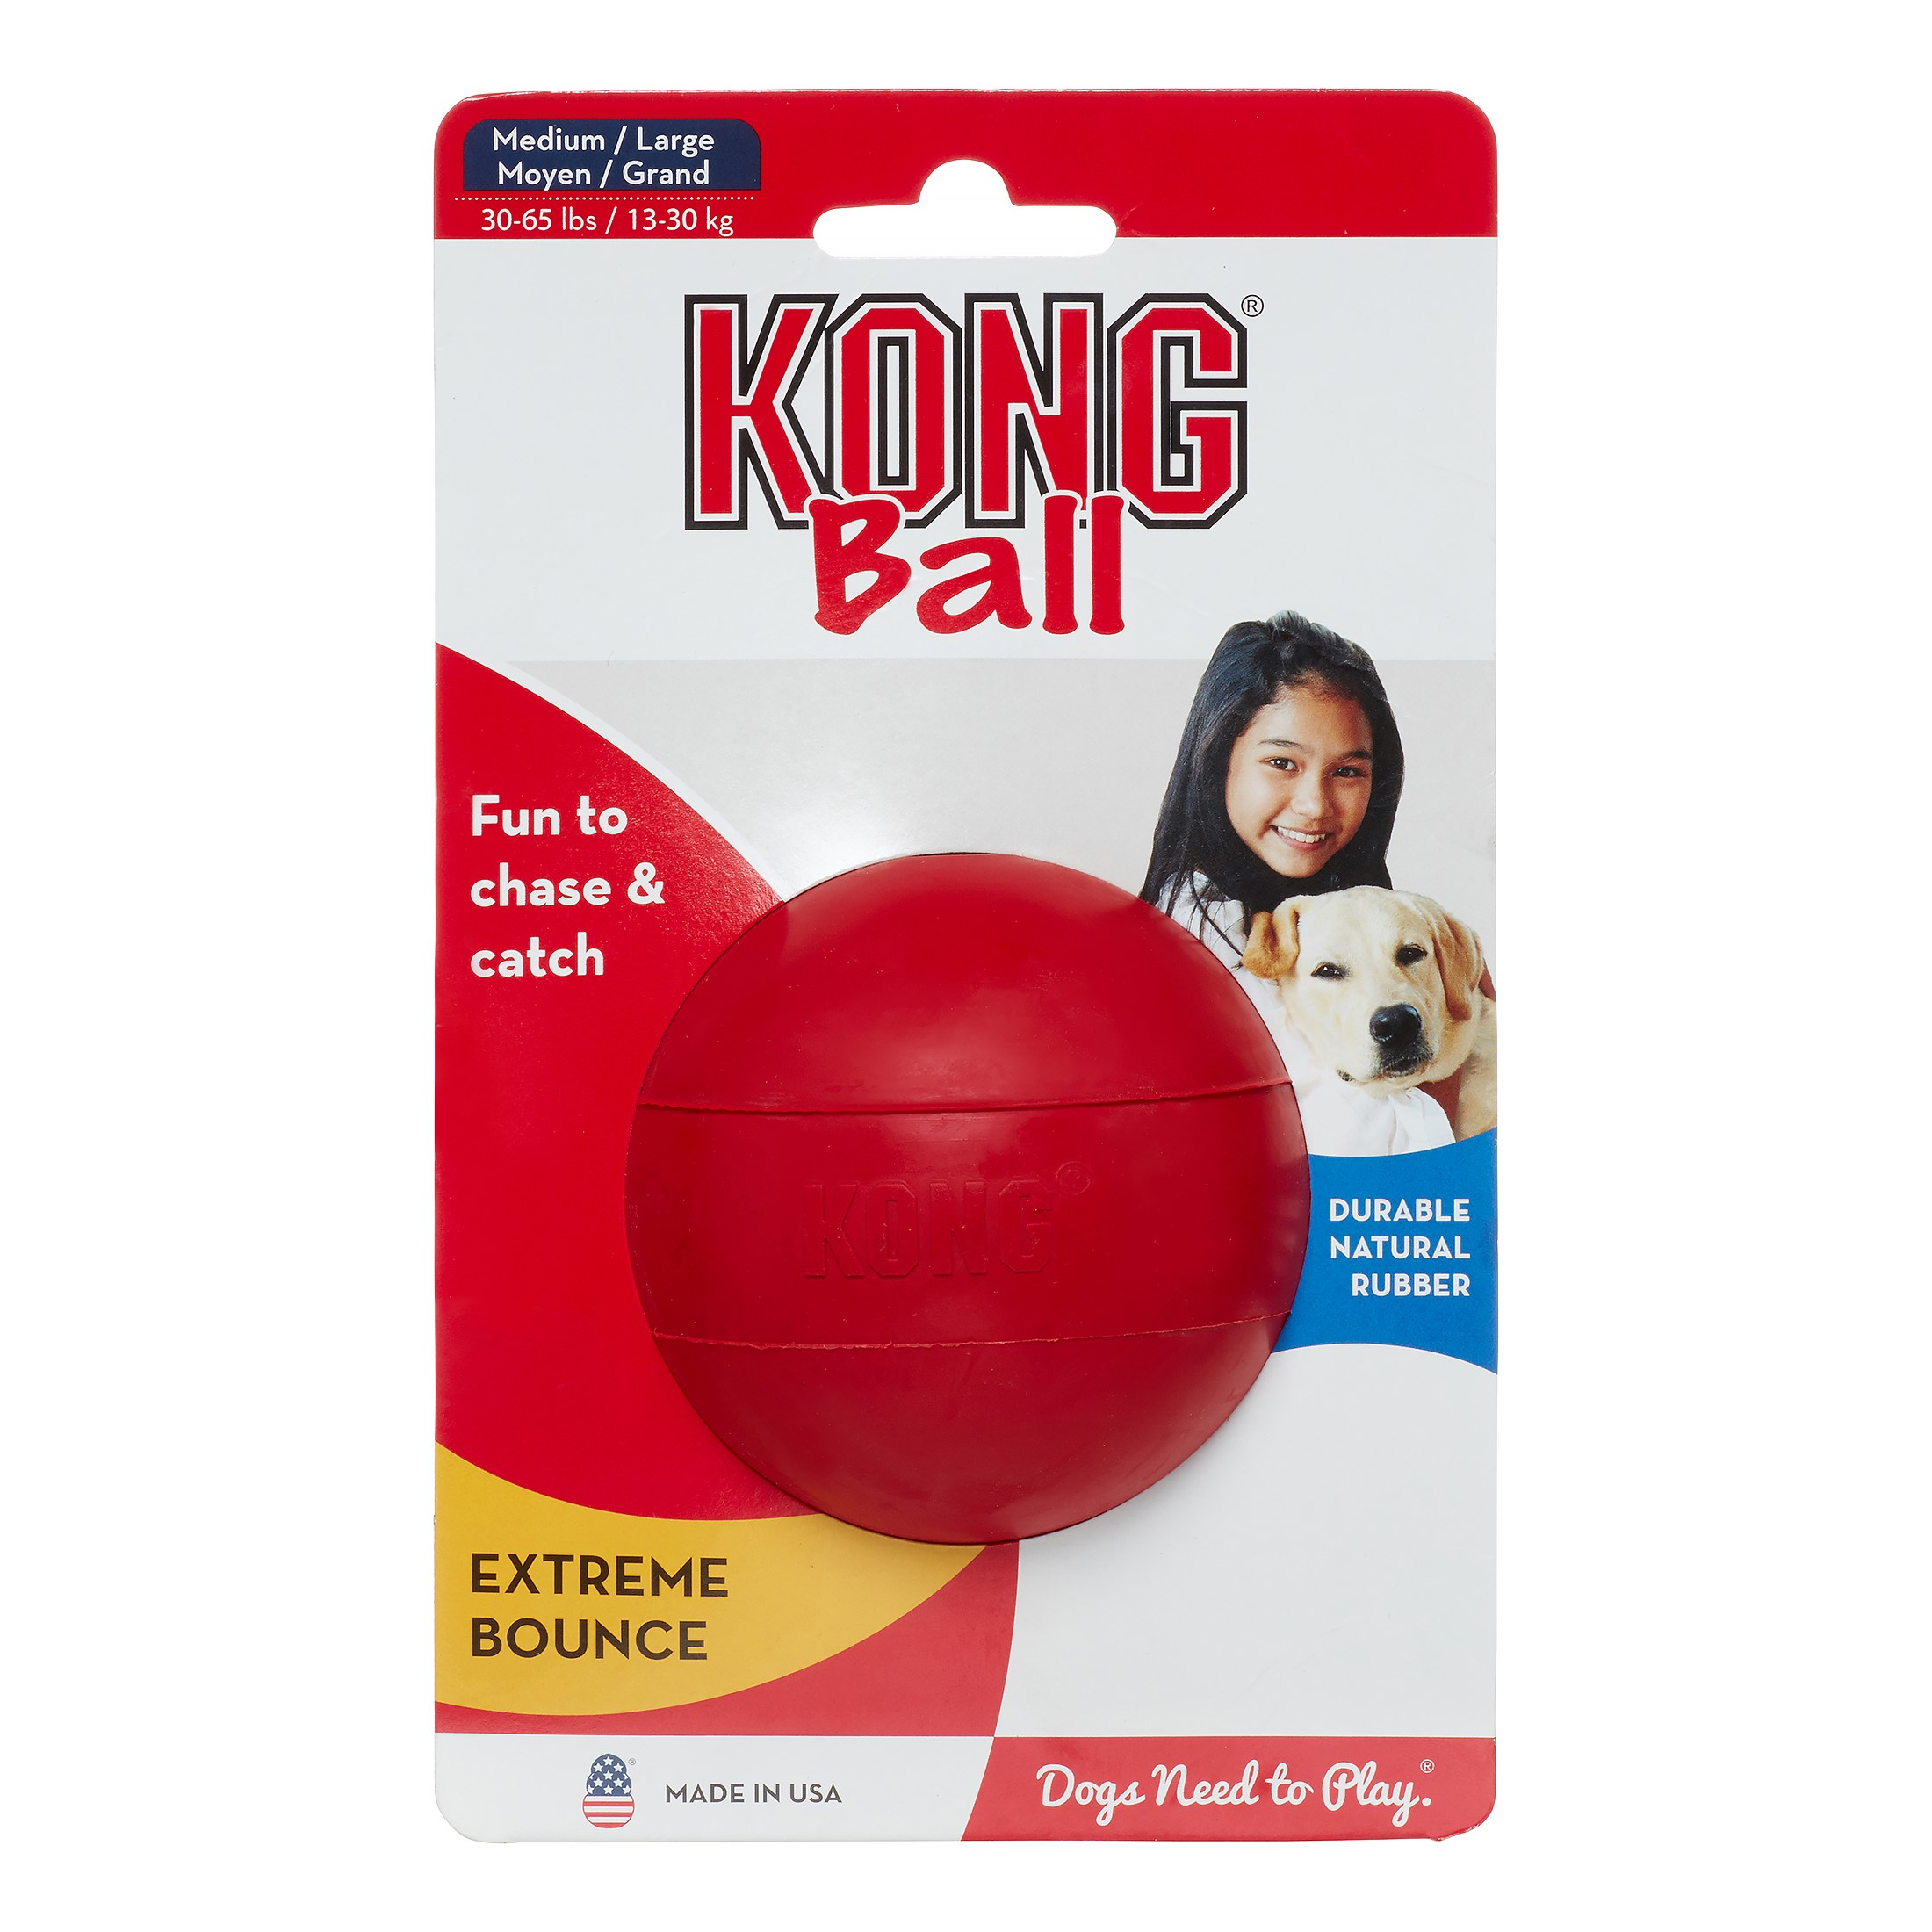 KONG Ball Dog Toy, Red, Medium/Large